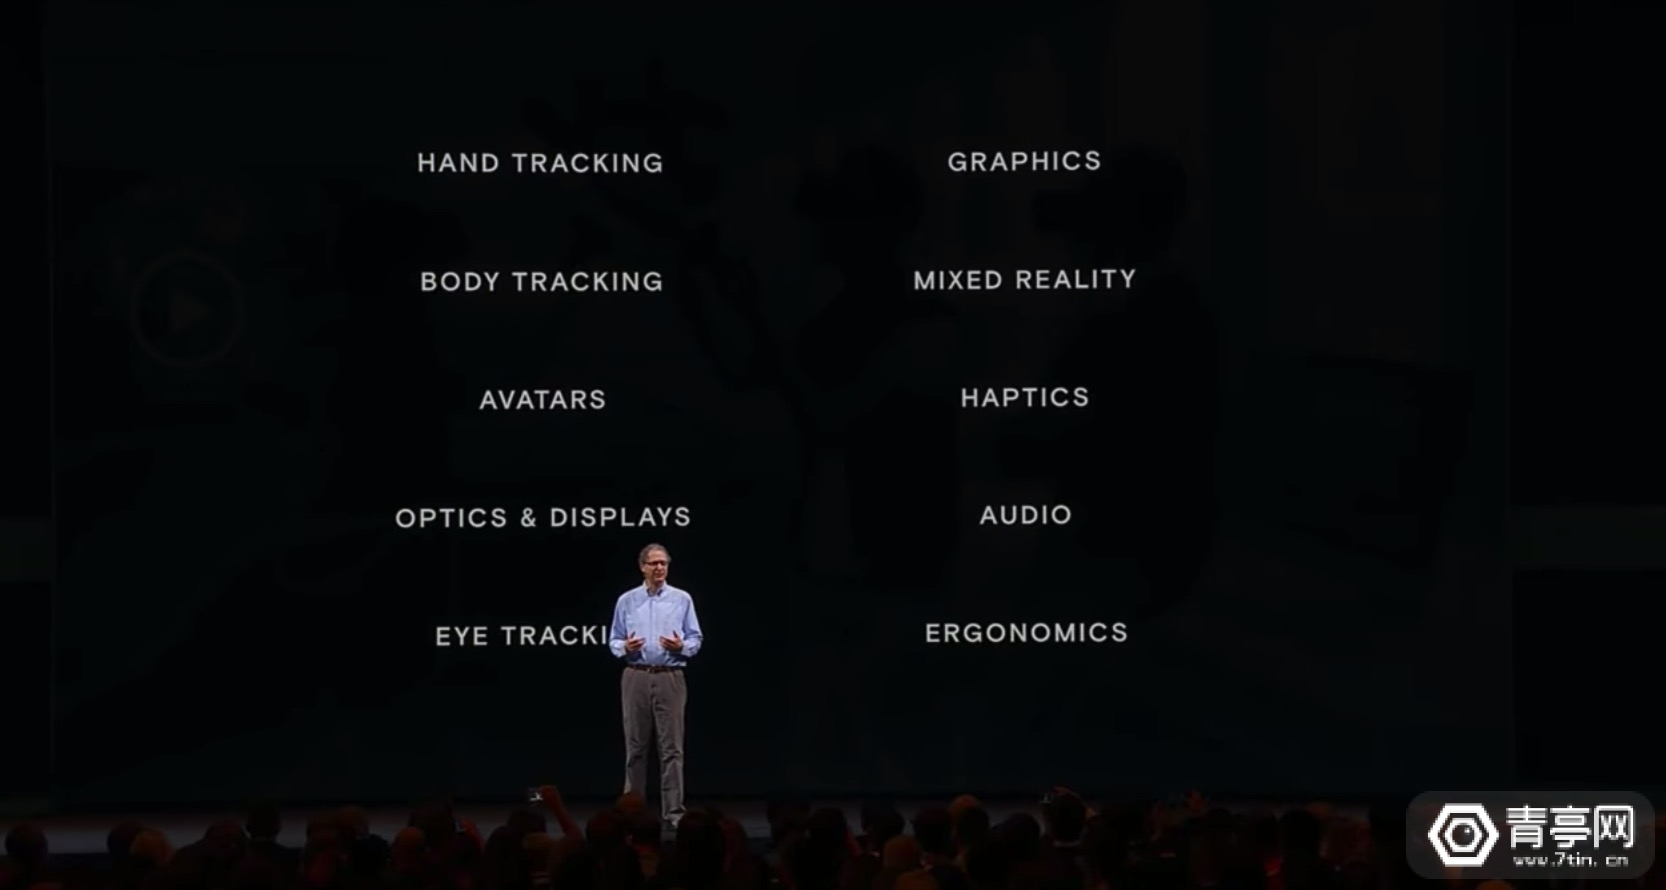 OC 6大会:Oculus首席科学家展望下一代VR,看好远程办公场景